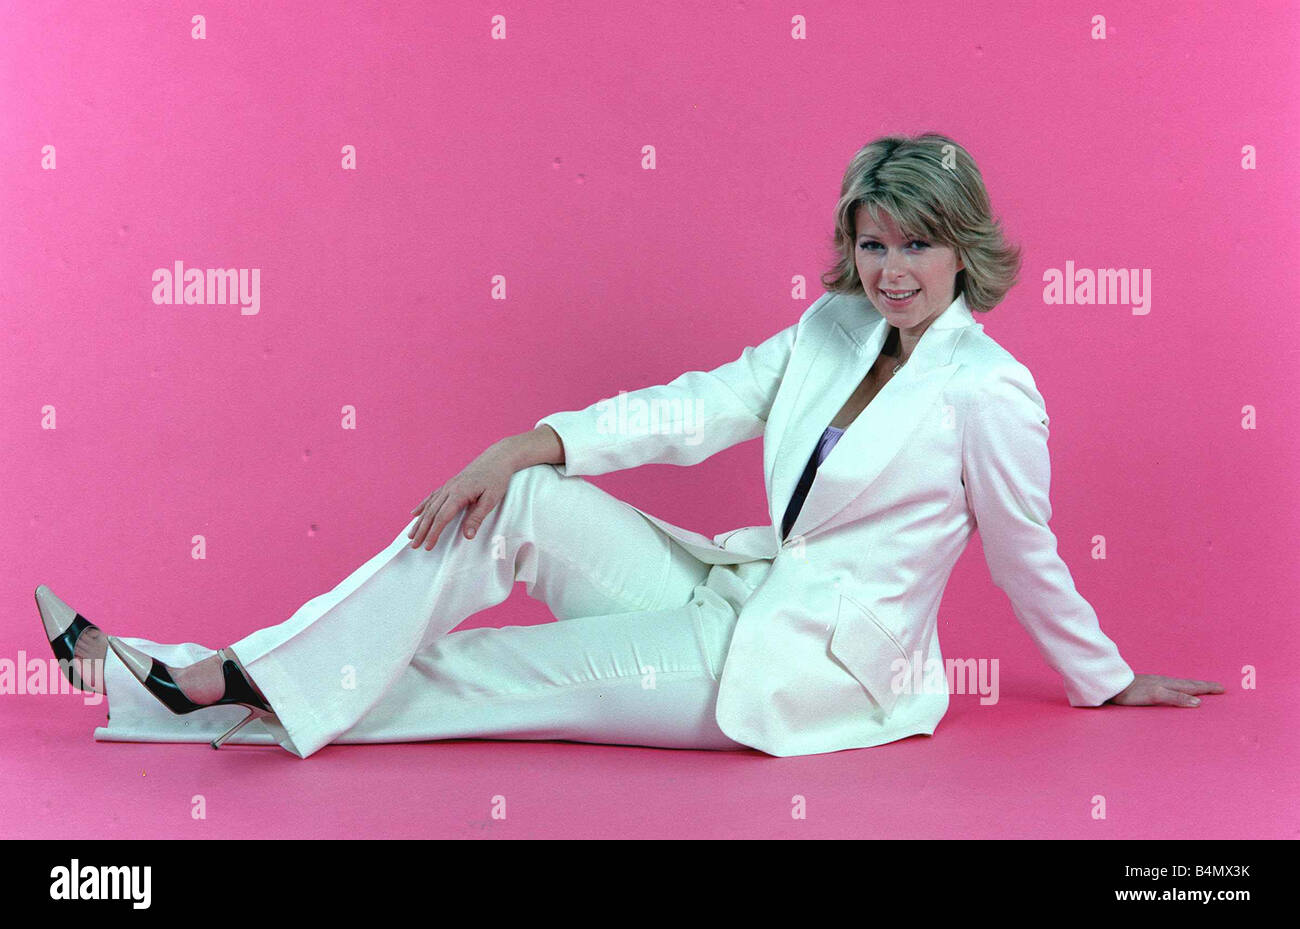 Kate Garraway GMTV Presenter February 2002 - Stock Image